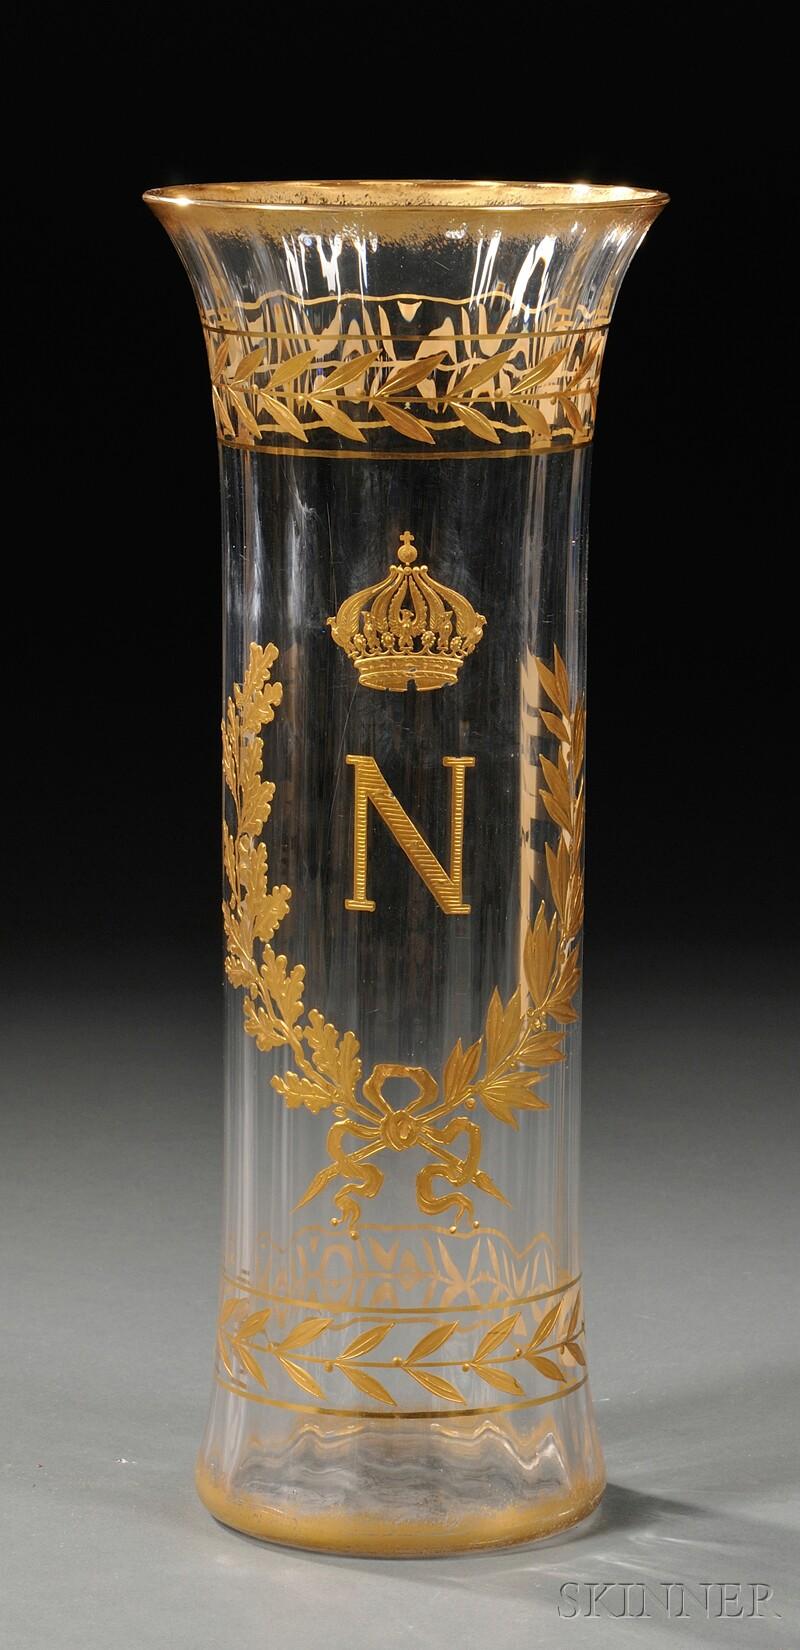 Napoleonic Gilded Glass Vase